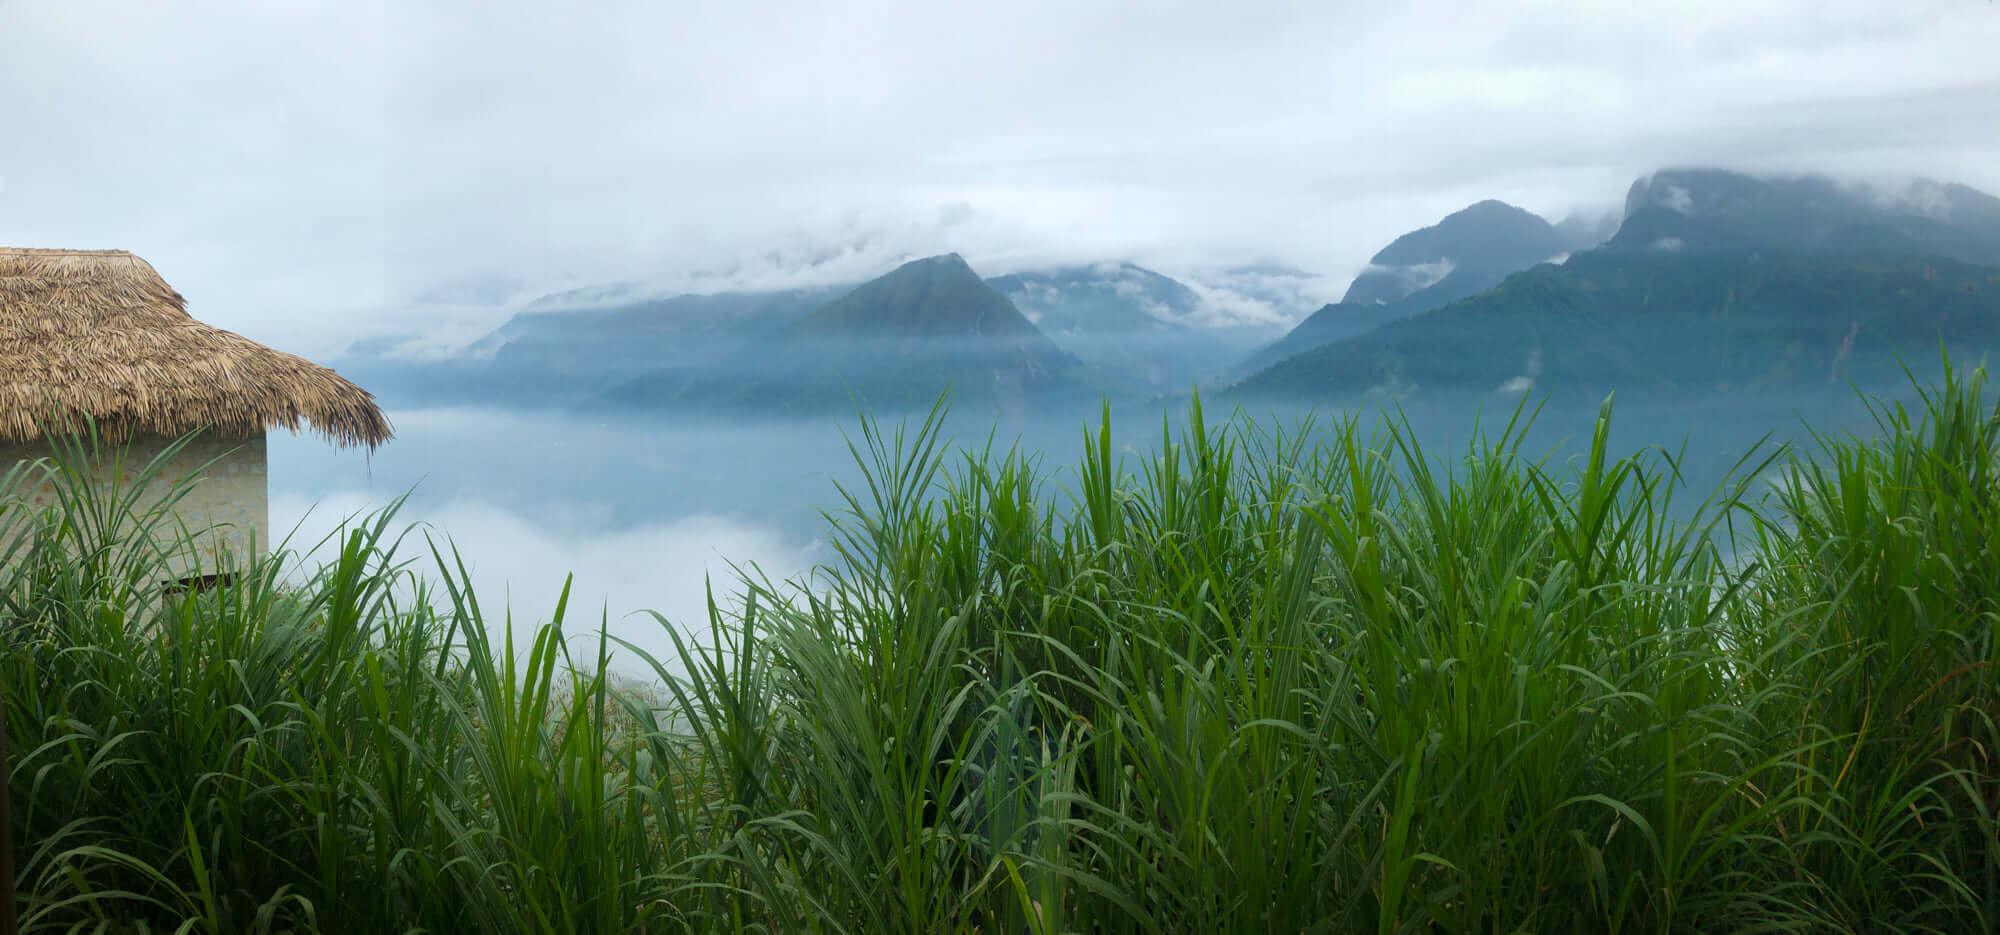 mountain landscape from Topas Ecolodge Sapa